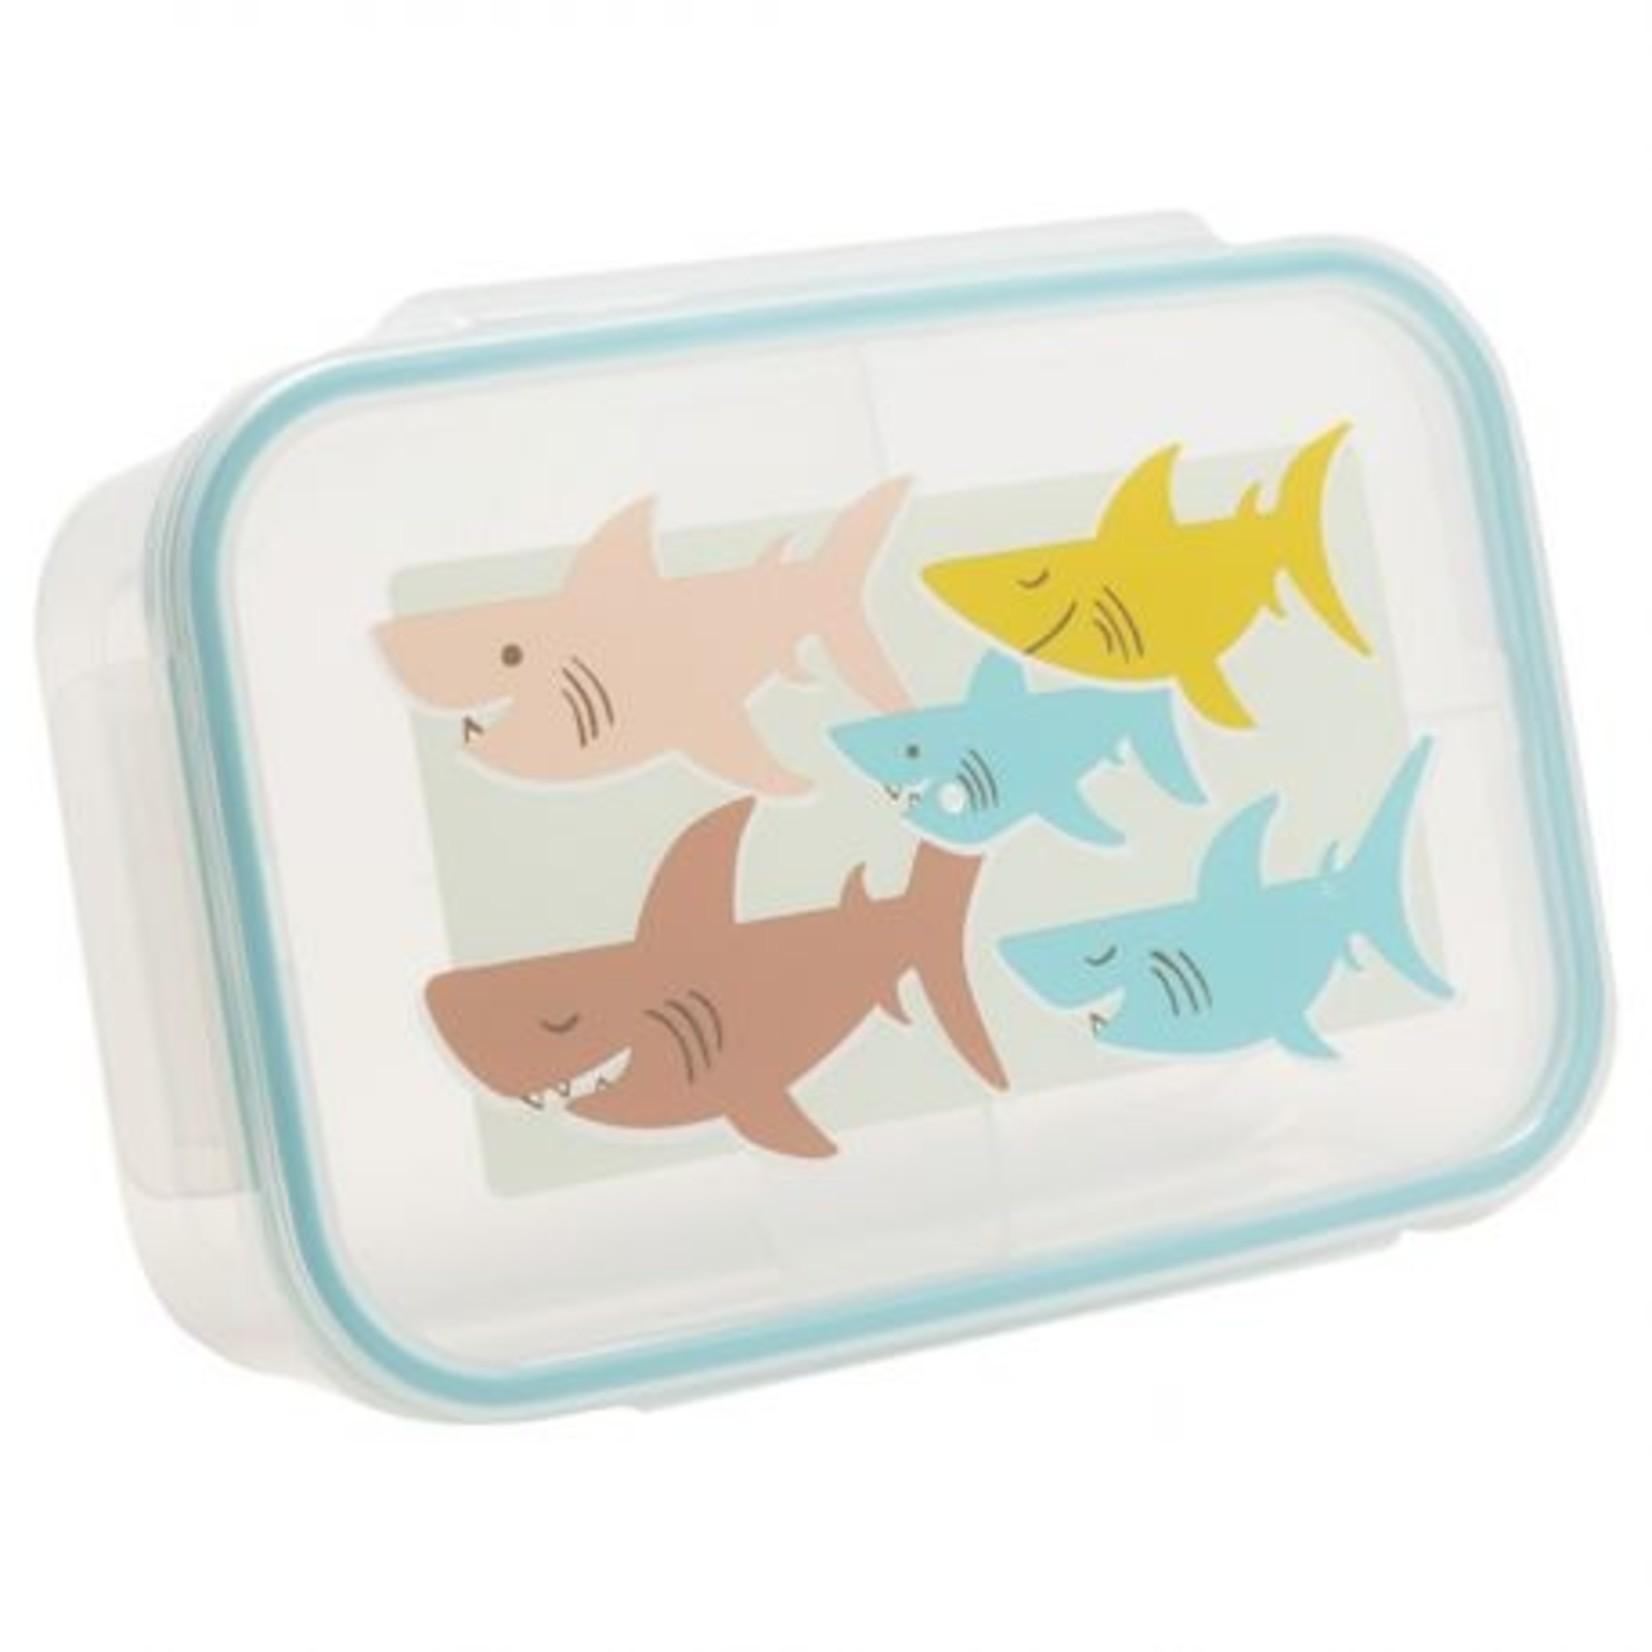 Sugarbooger Sugarbooger Good Lunch Bento Box Smiley Shark